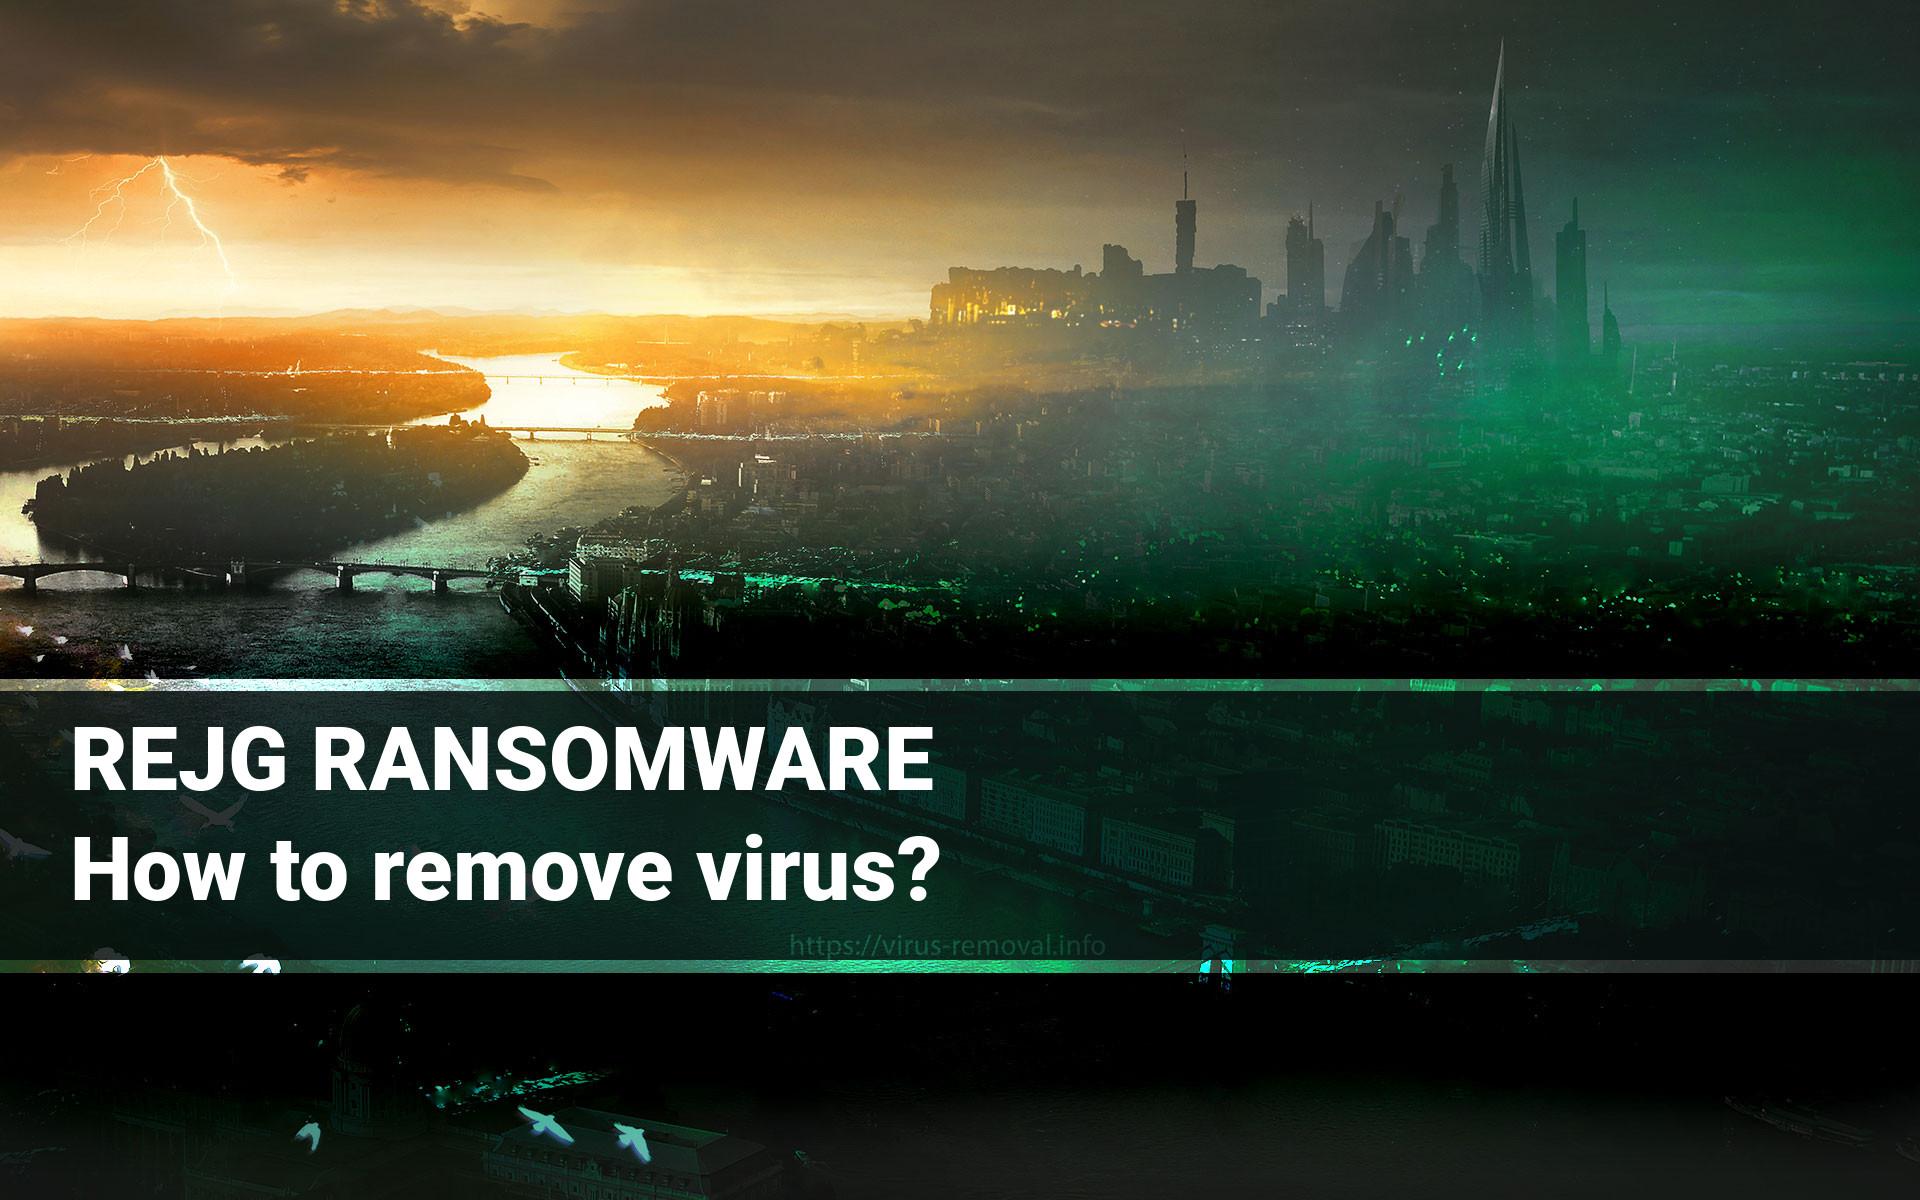 REJG ransomware